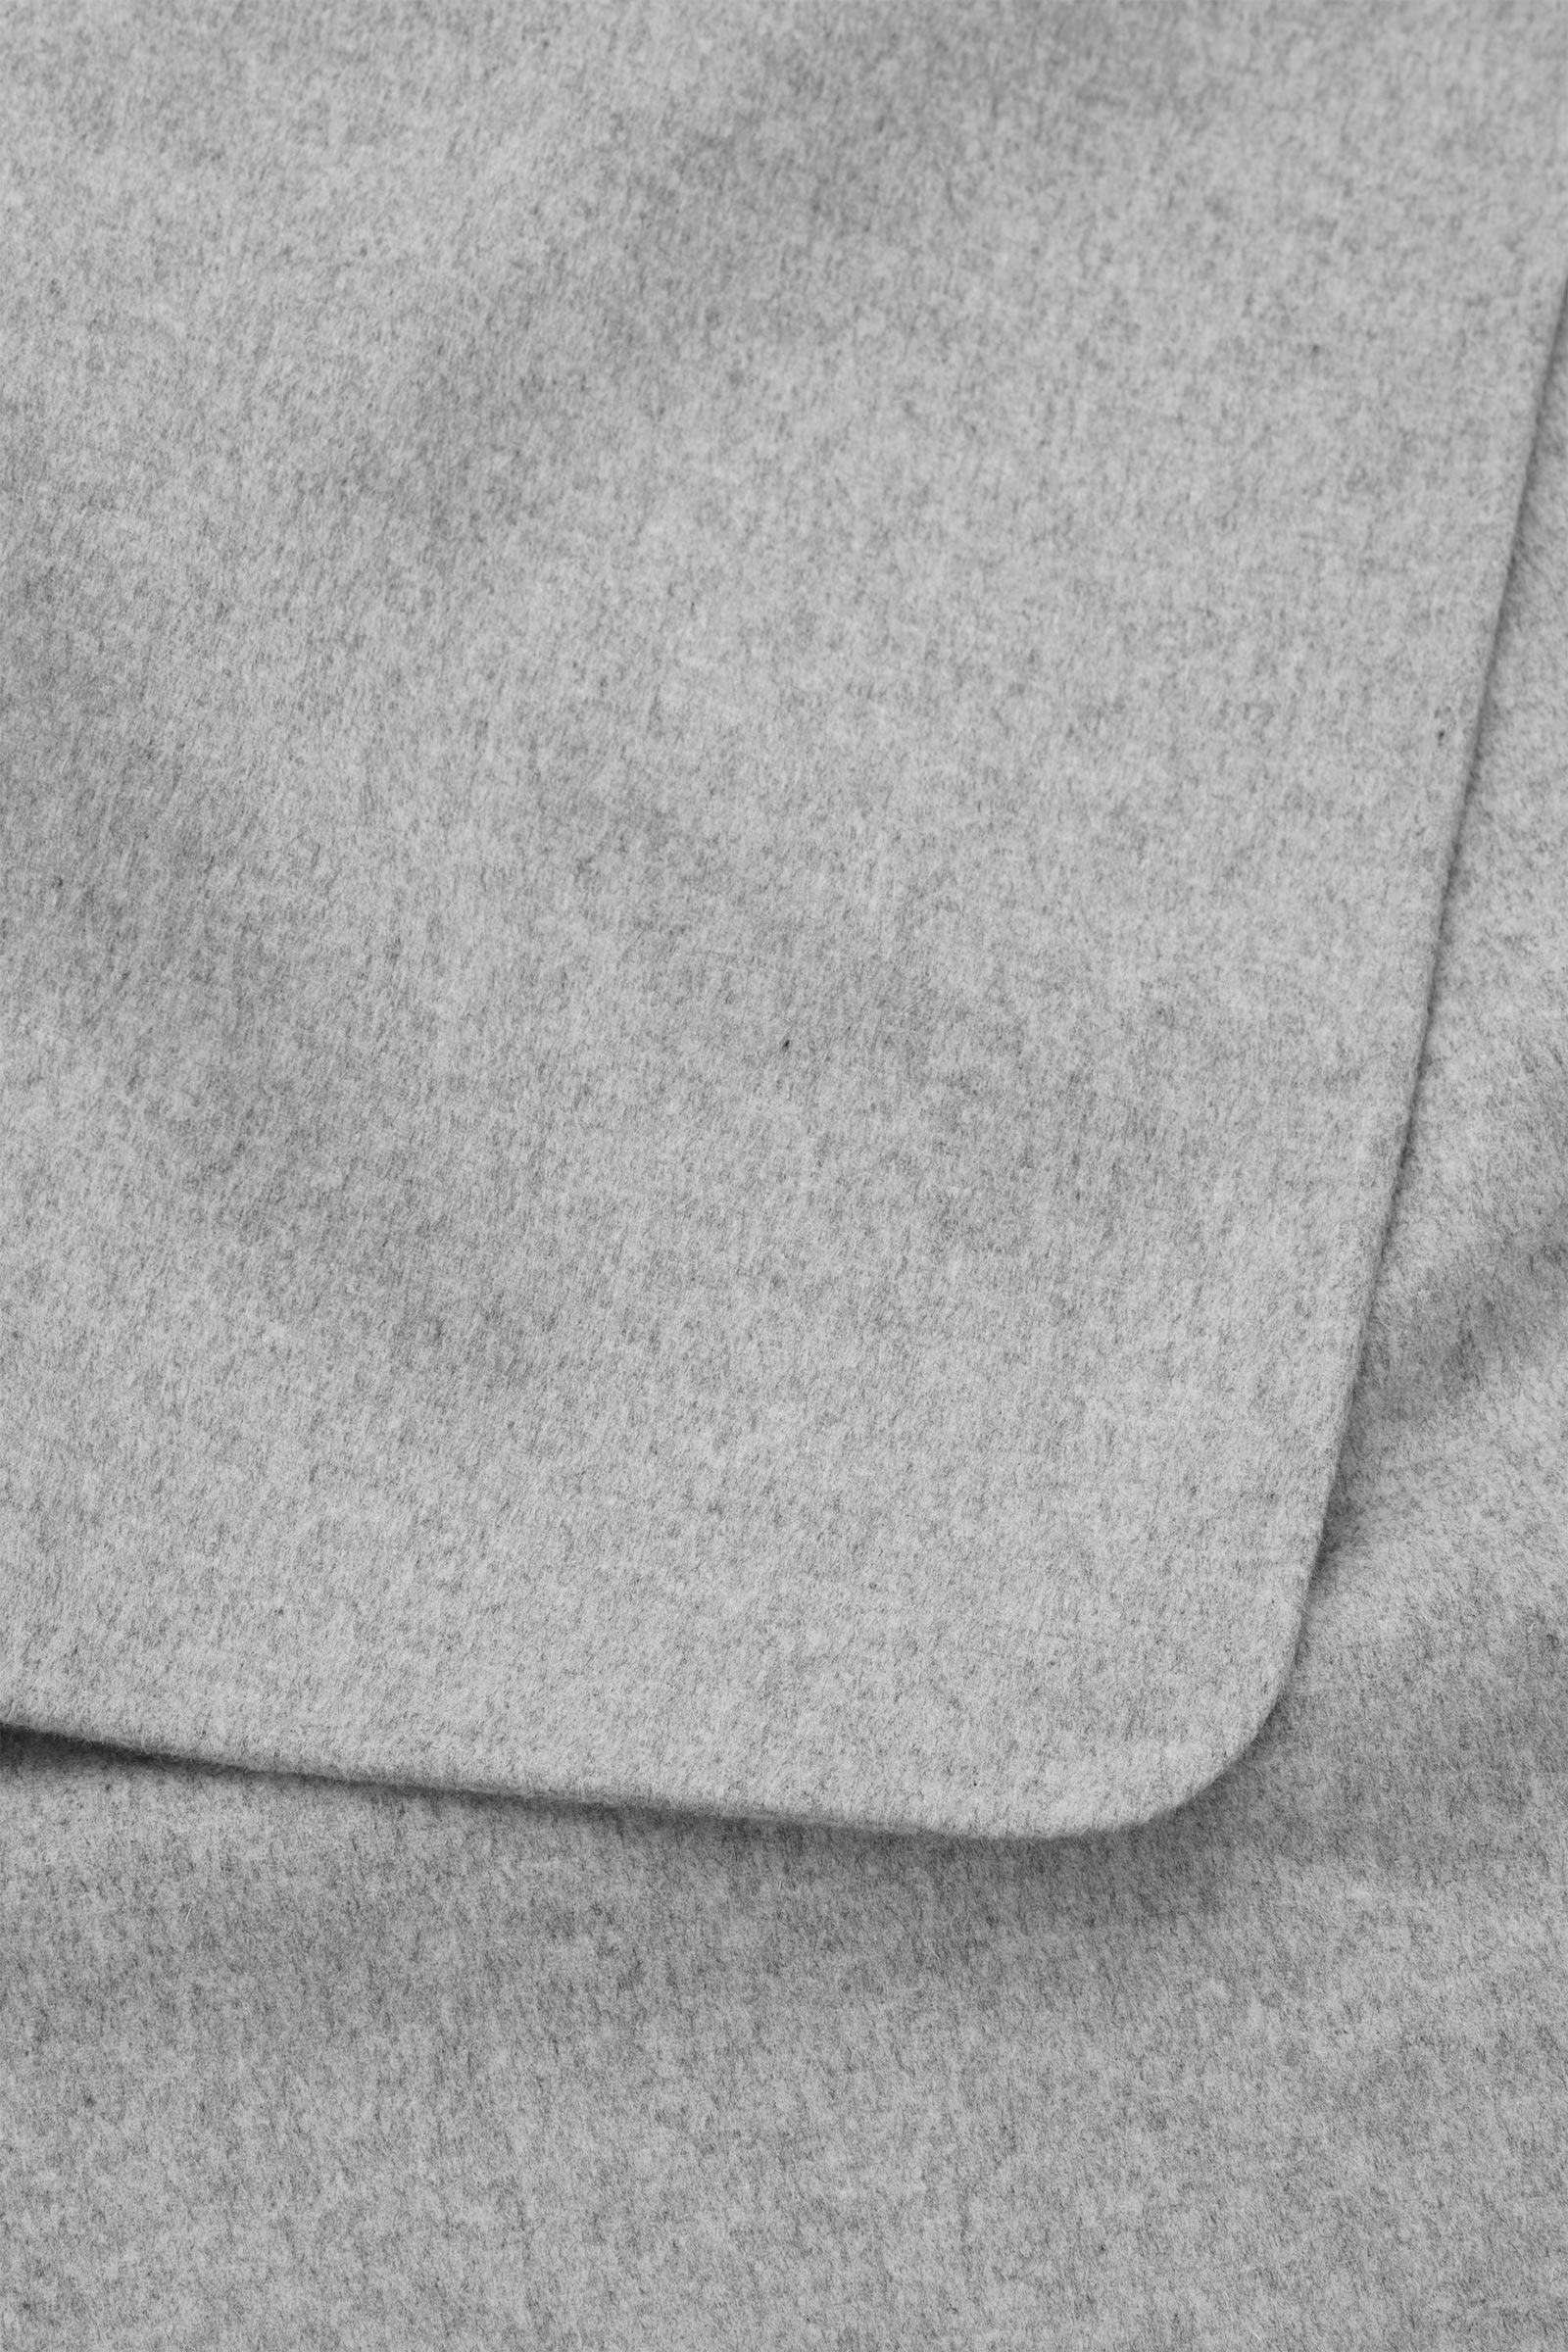 COS 울 믹스 케이프의 라이트 그레이컬러 Detail입니다.